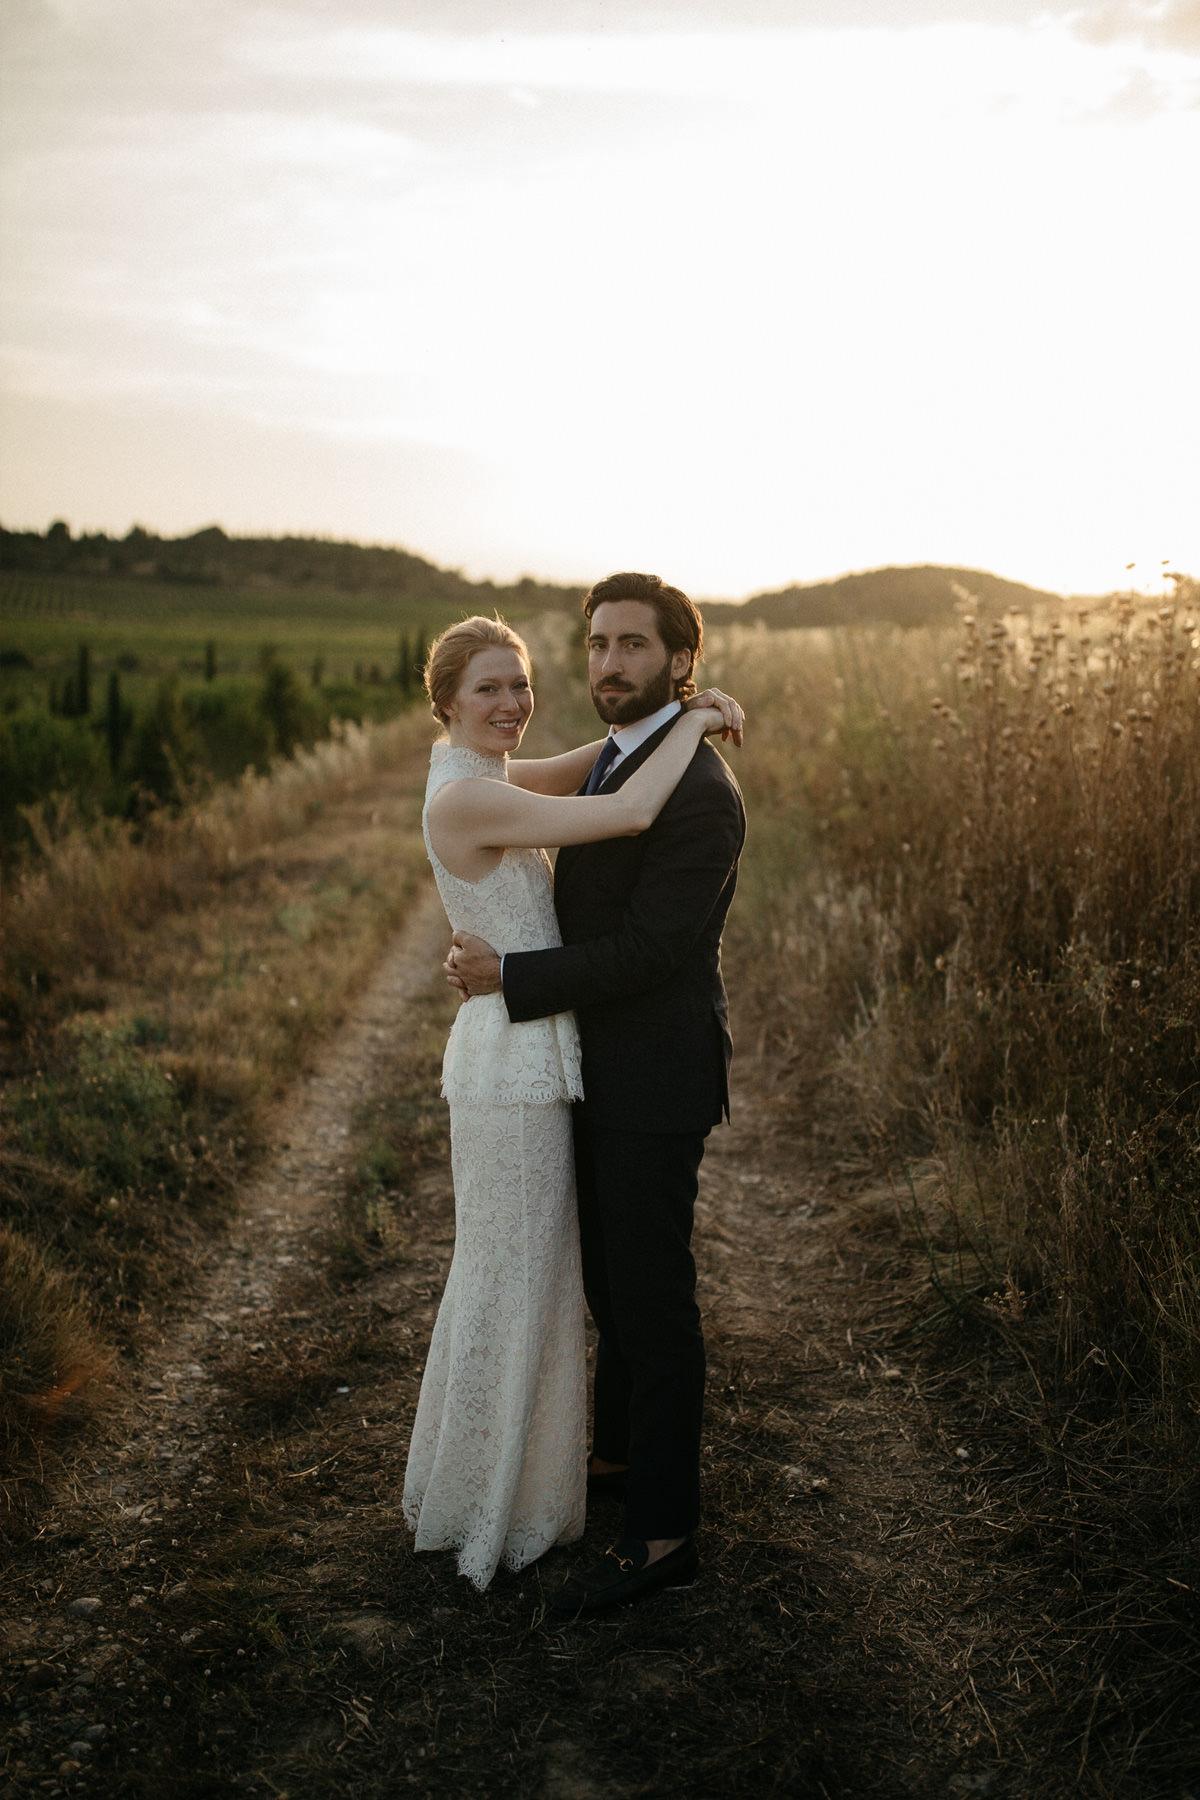 373-lifestories-photography-wedding-Frances-Jonah-2017-_MG_3097